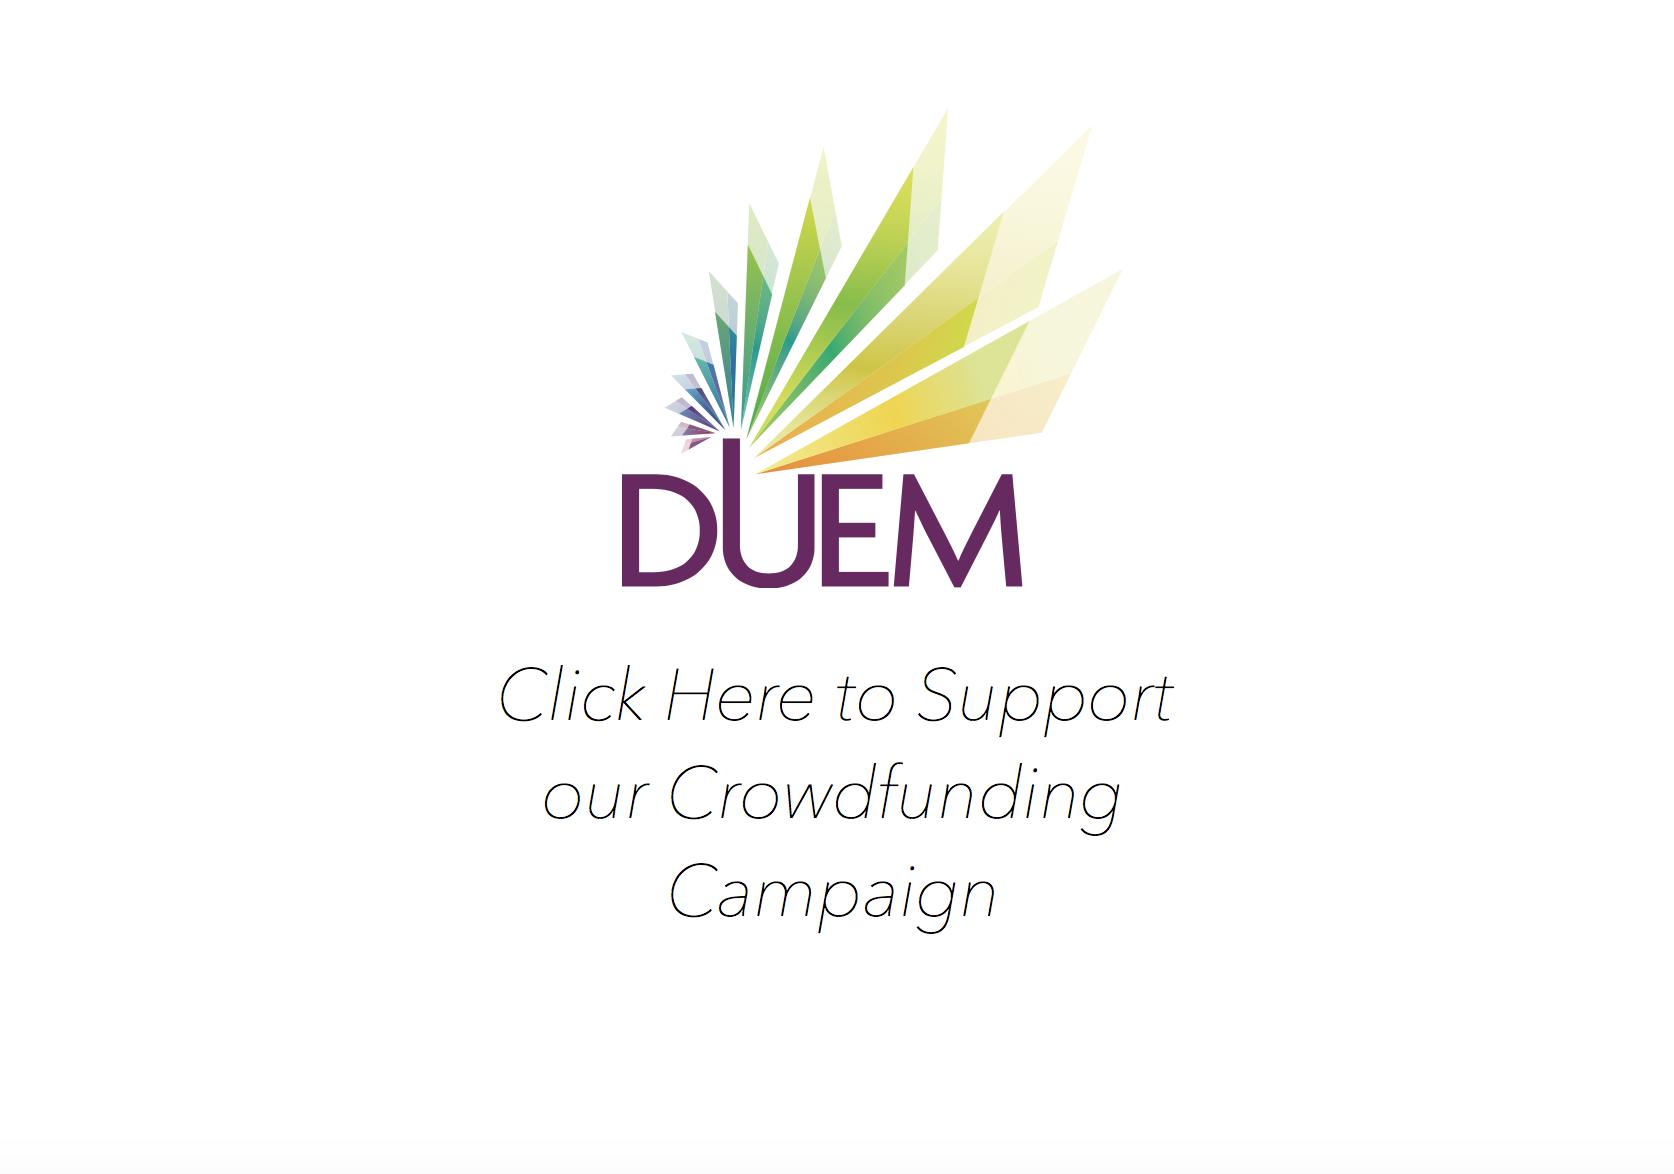 Crowdfunding Link DUEM Indiegogo